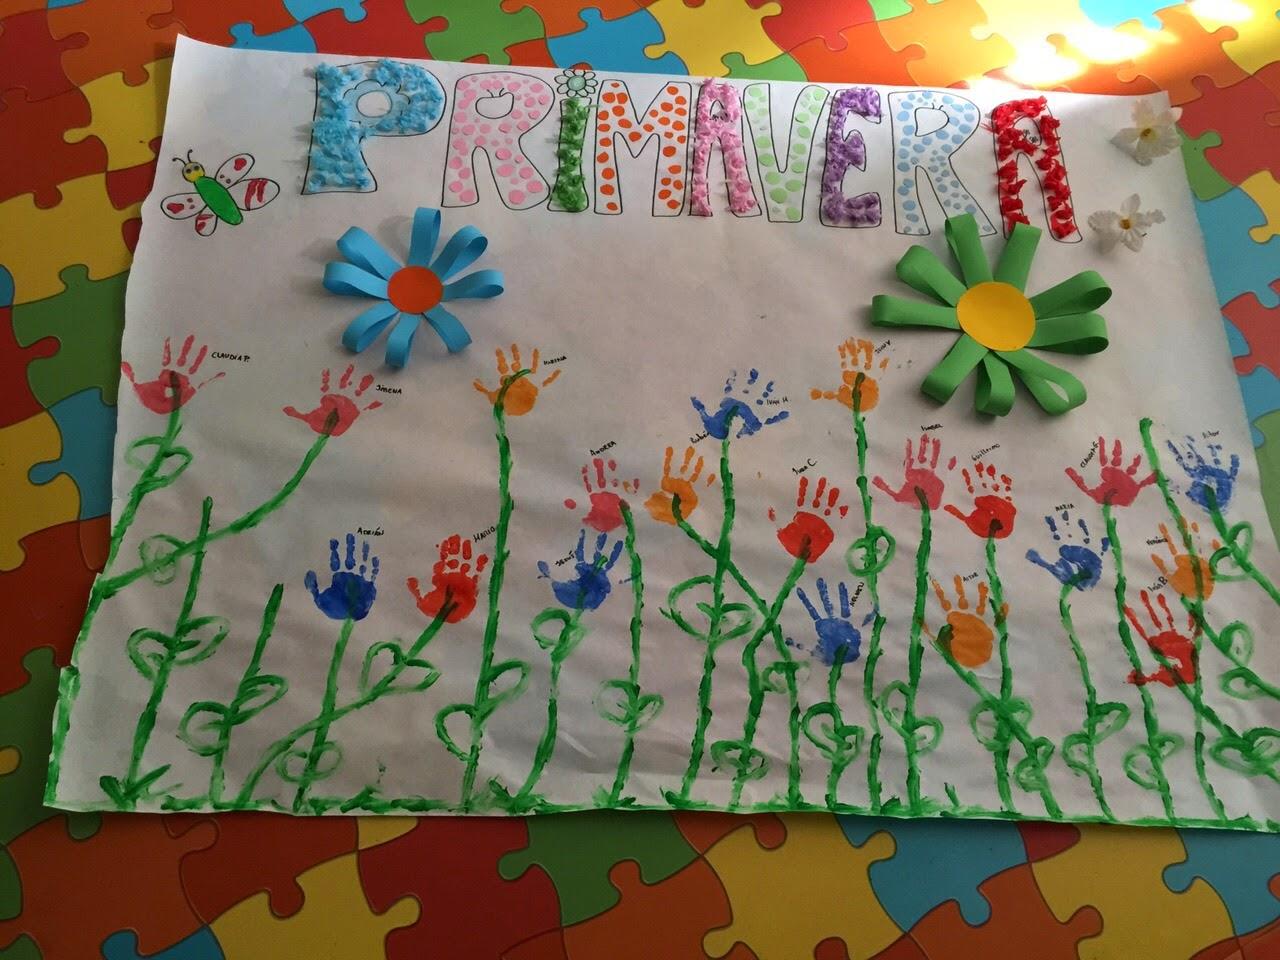 Mis nubecitas de infantil mural de la primavera for Caracteristicas de un mural